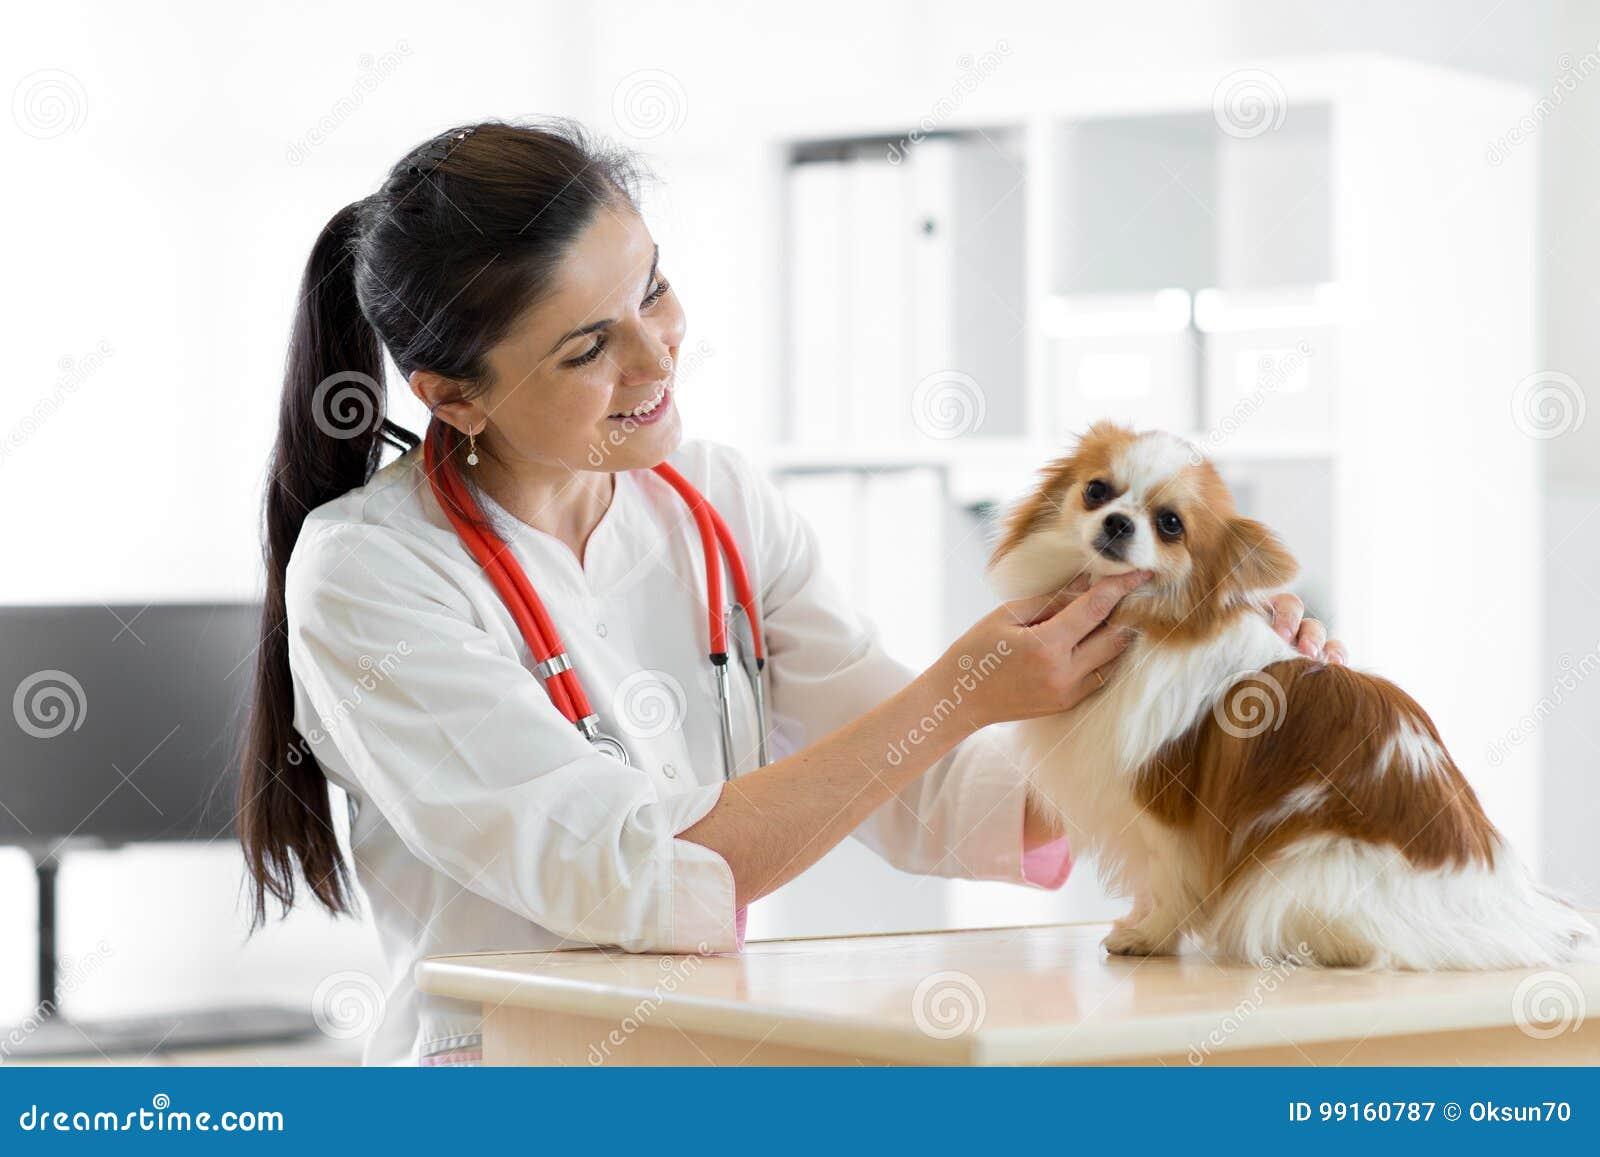 Veterinário de sorriso com cão, na tabela na clínica do veterinário